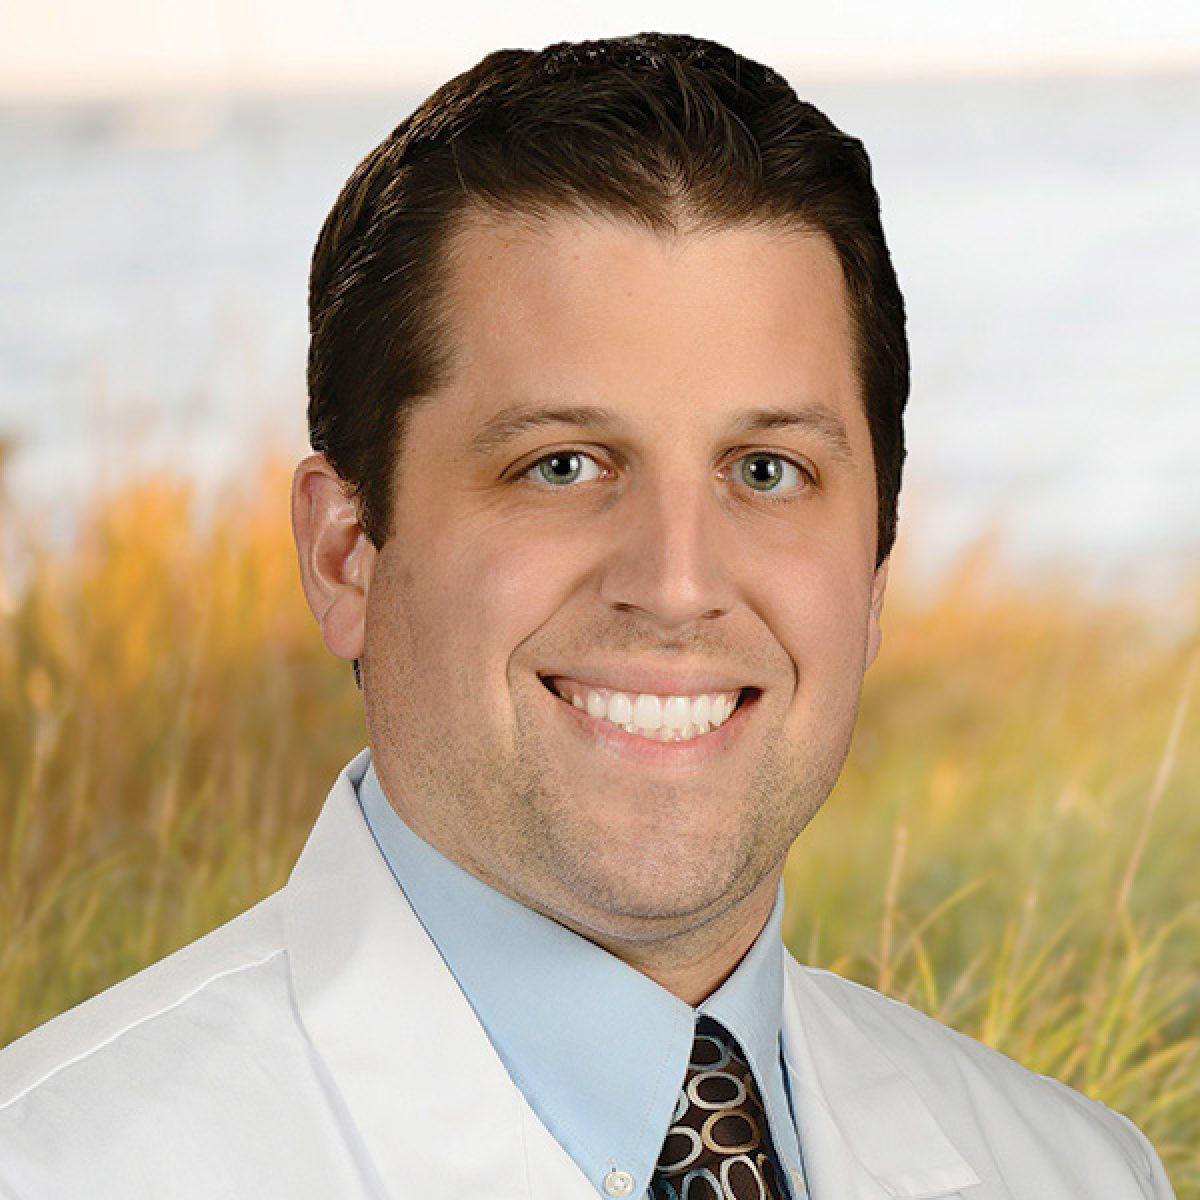 Stephen L. Ryder, M.S., MPAS, PA-C